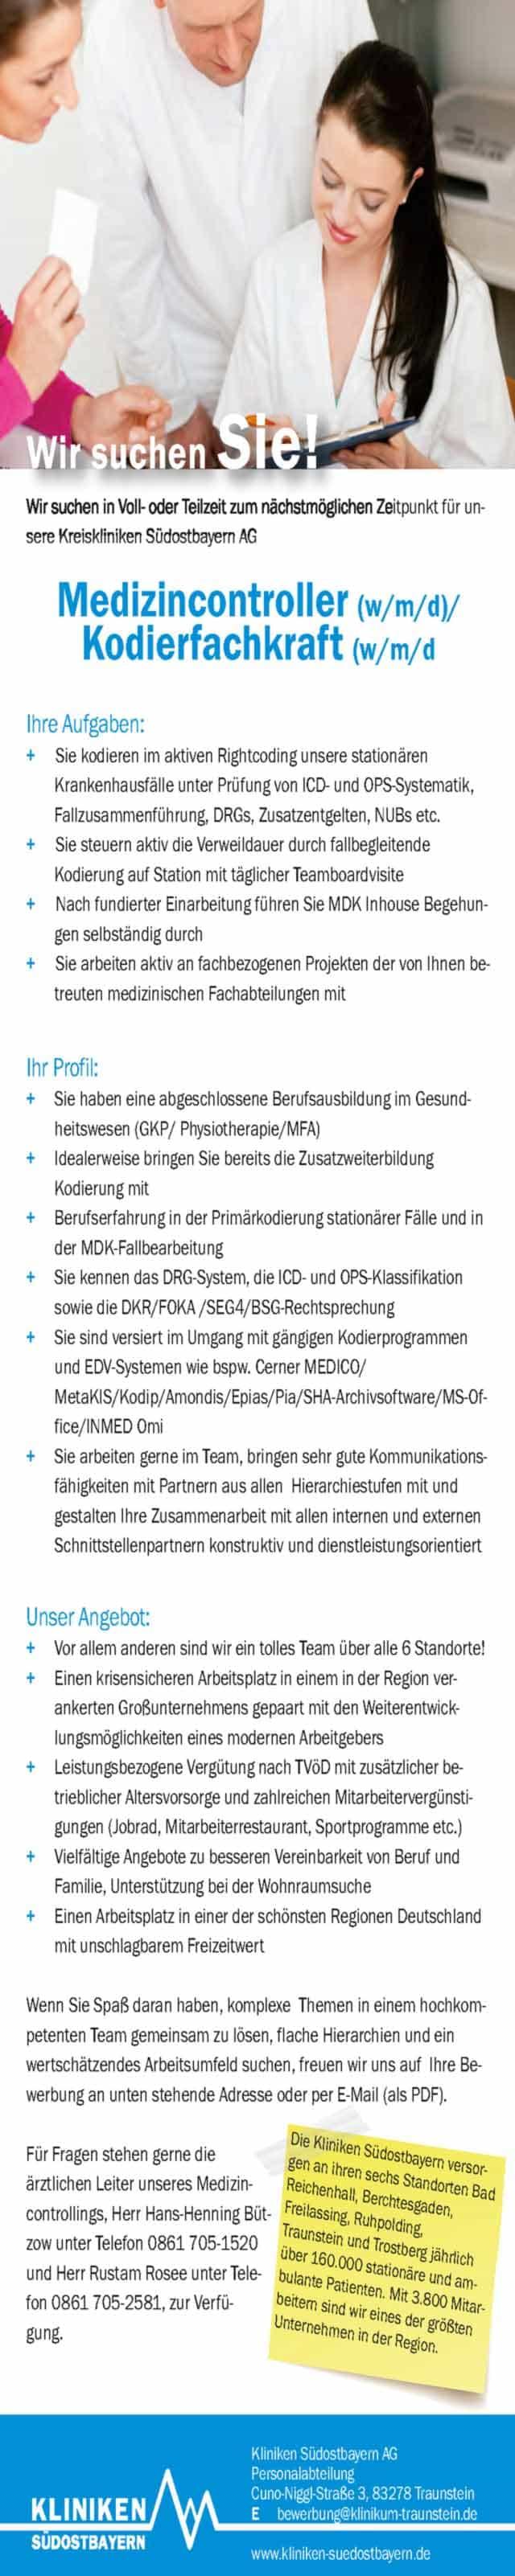 Kliniken Südostbayern AG: Medizincontroller / Kodierfachkraft (m/w/d)